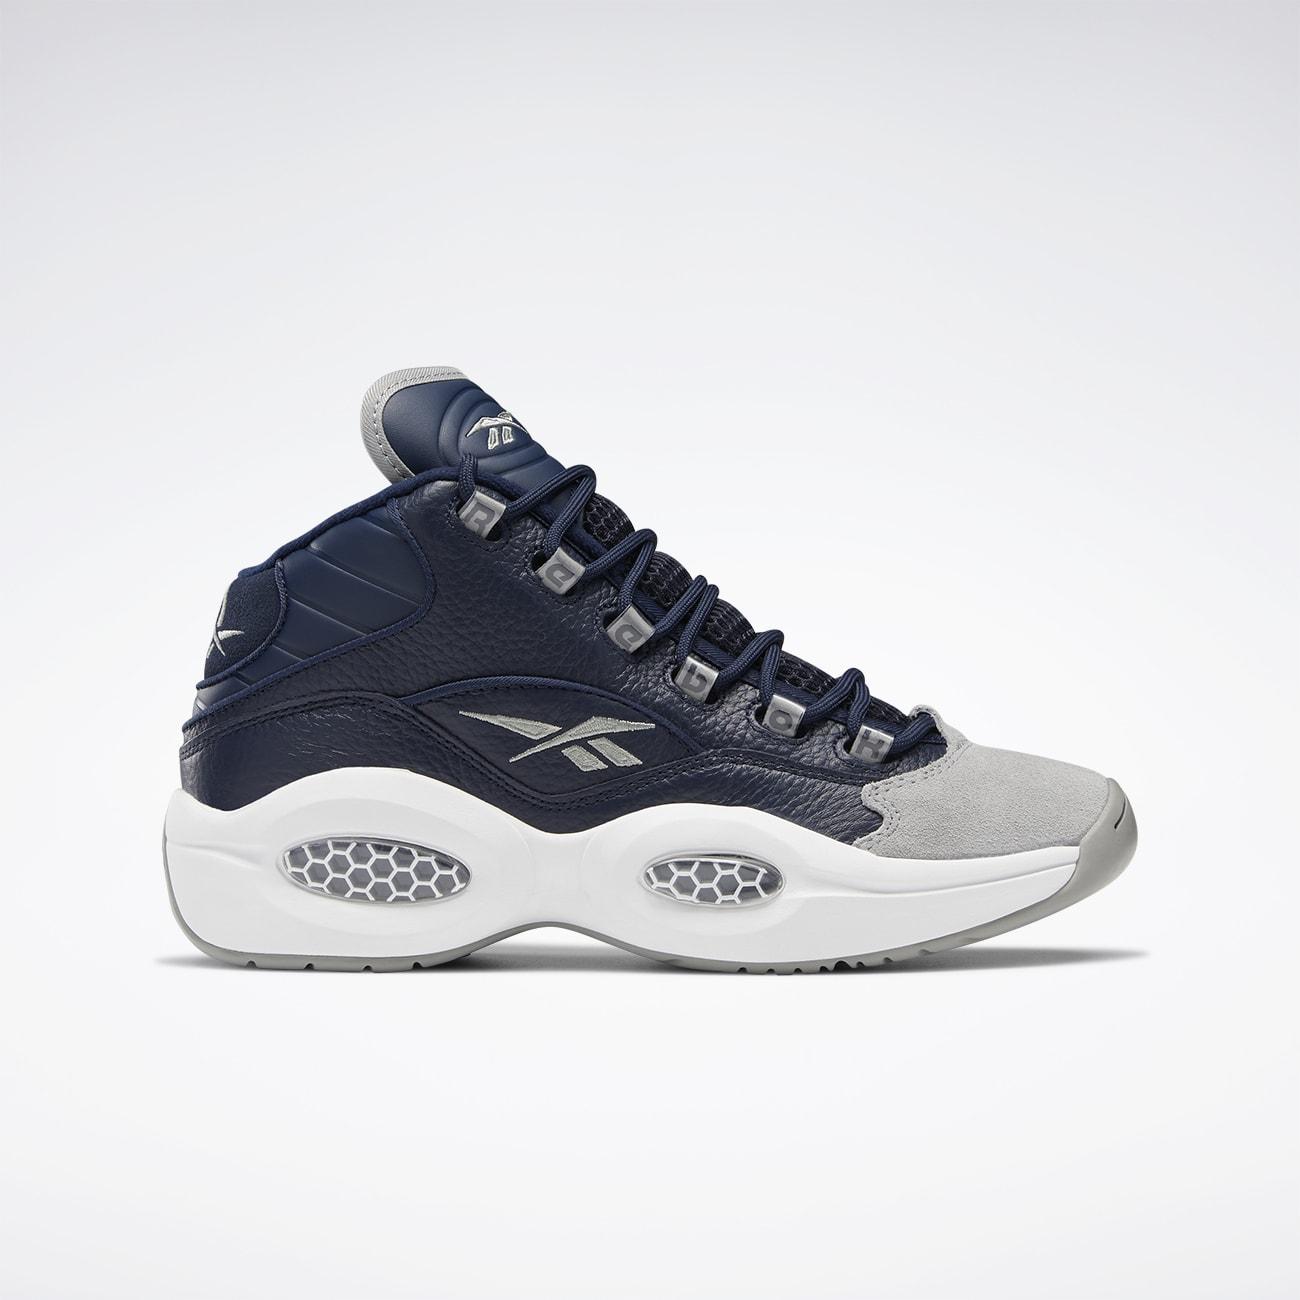 The Top 7 Retro Reebok Basketball Shoes